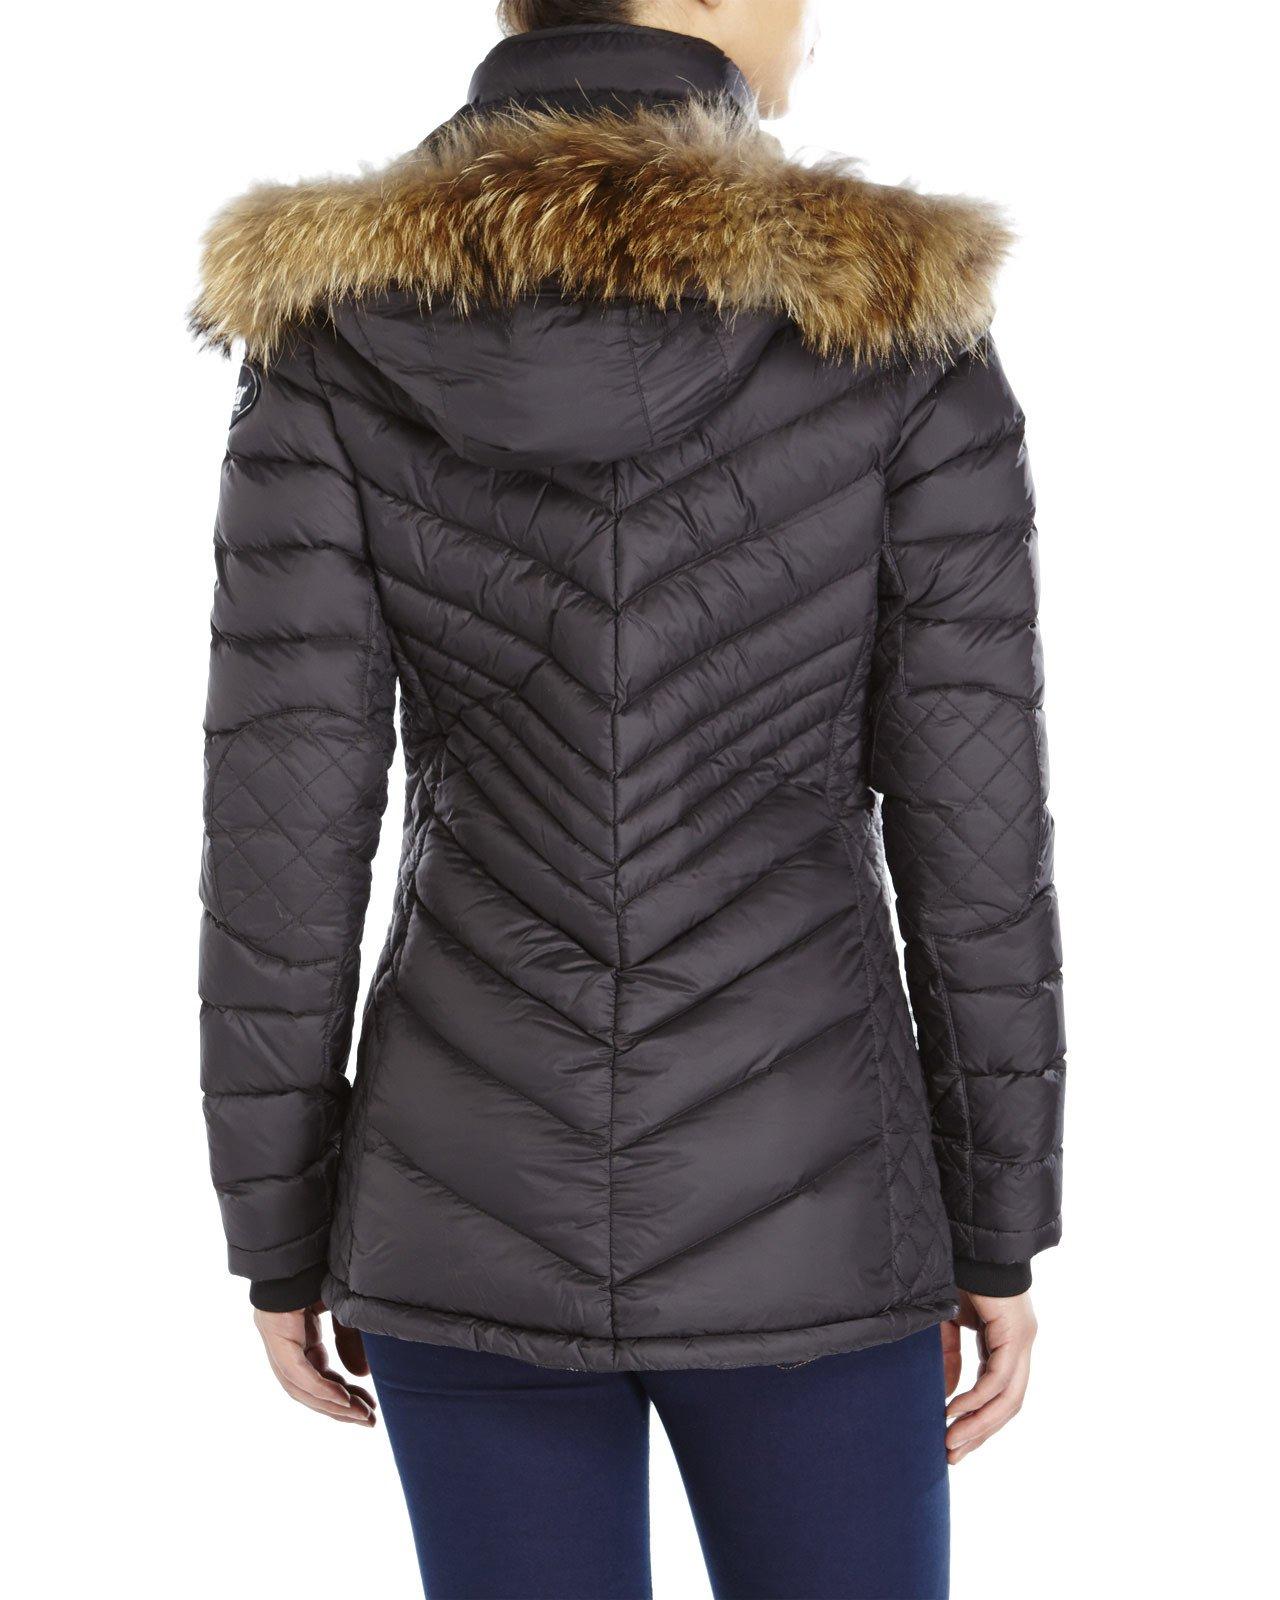 Pajar Charlotte Real Fur Trim Down Jacket in Black | Lyst